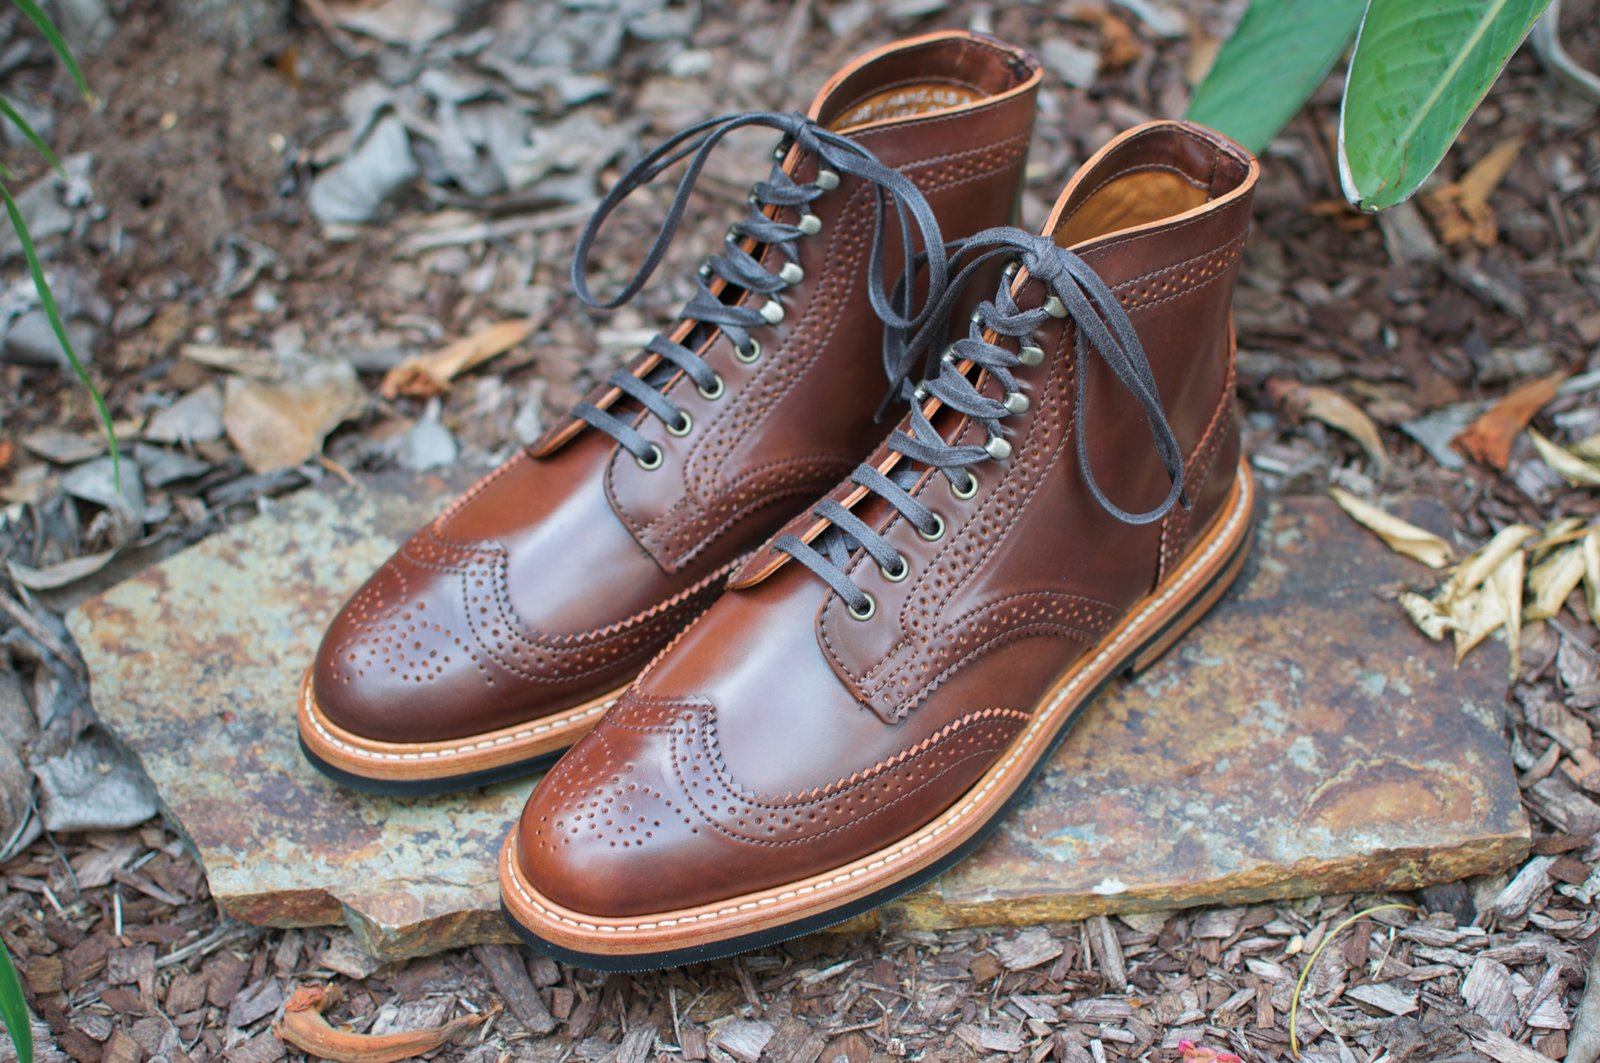 Rancourt Color #4 Shell Cordovan WT Boots - 2020-05-16 - 1.jpg